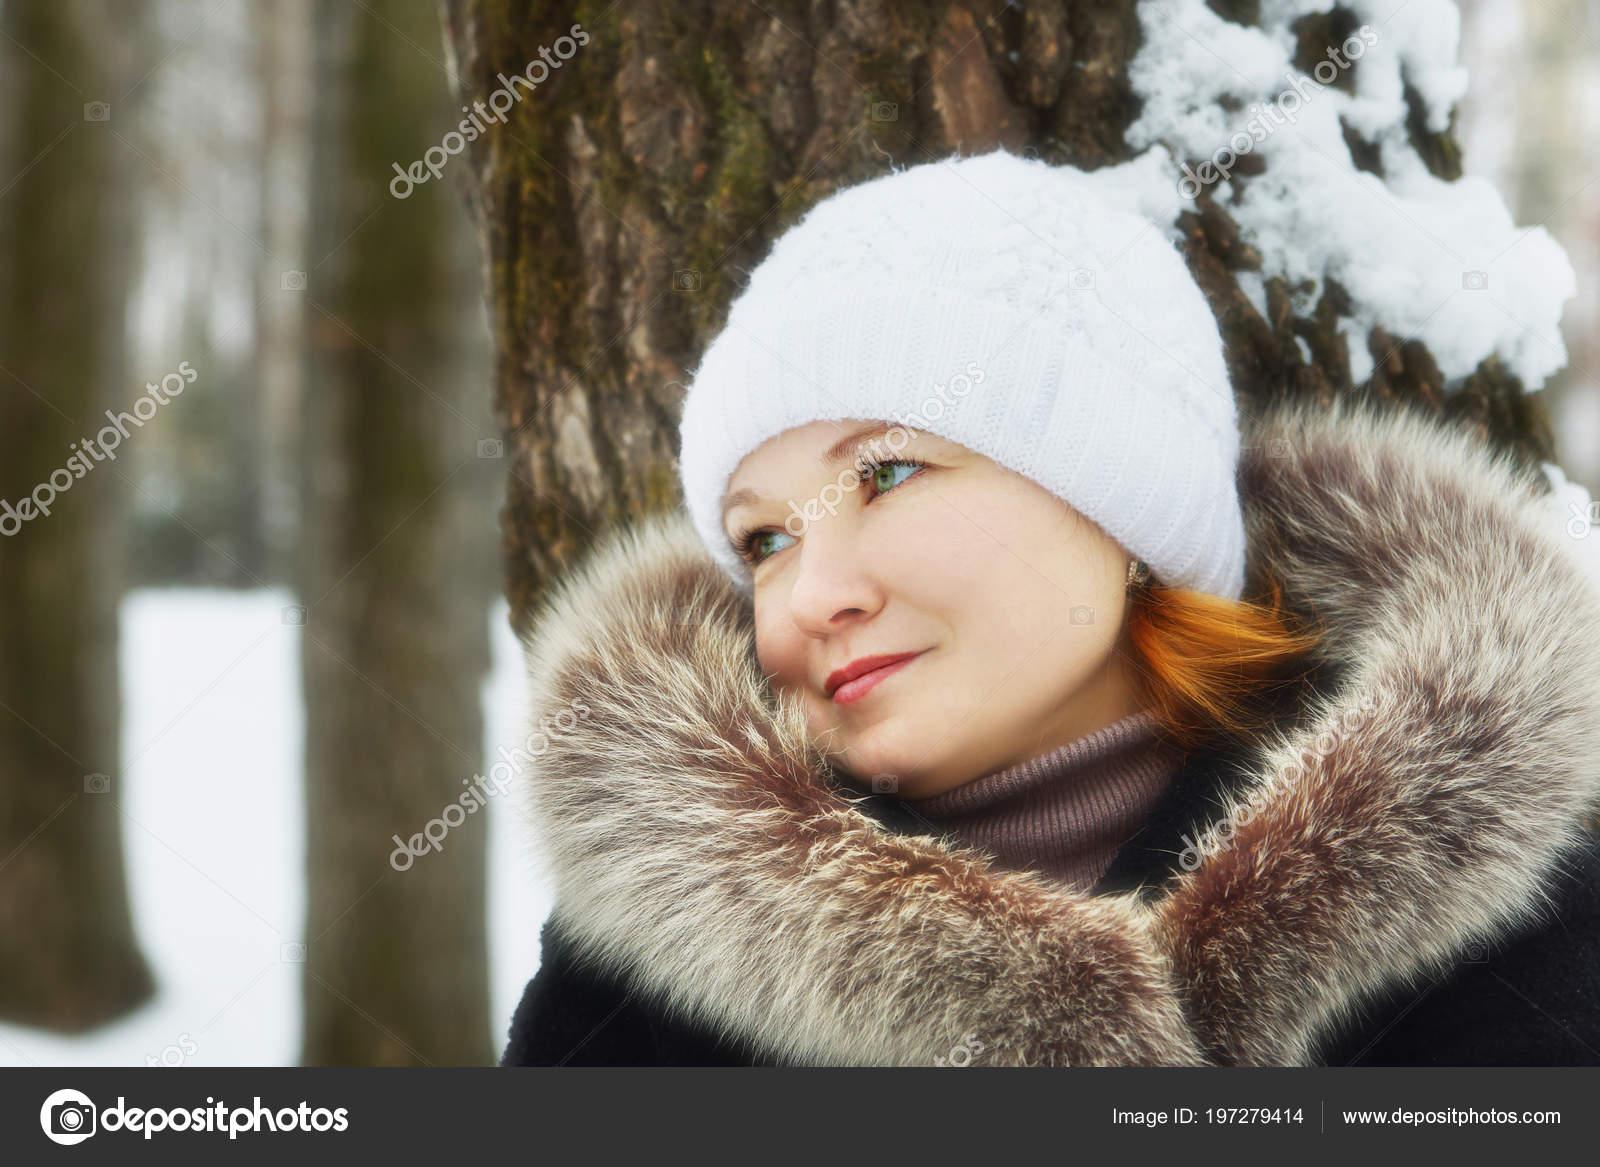 0d6cc526f6b4 Νέοι όμορφη γυναίκα που φοράει ένα παλτό με γούνινο γιακά αφράτο και λευκό  πλεκτό καπέλο έγειρε το δέντρο σε ένα χειμερινό πάρκο σε εξωτερικούς χώρους  ...